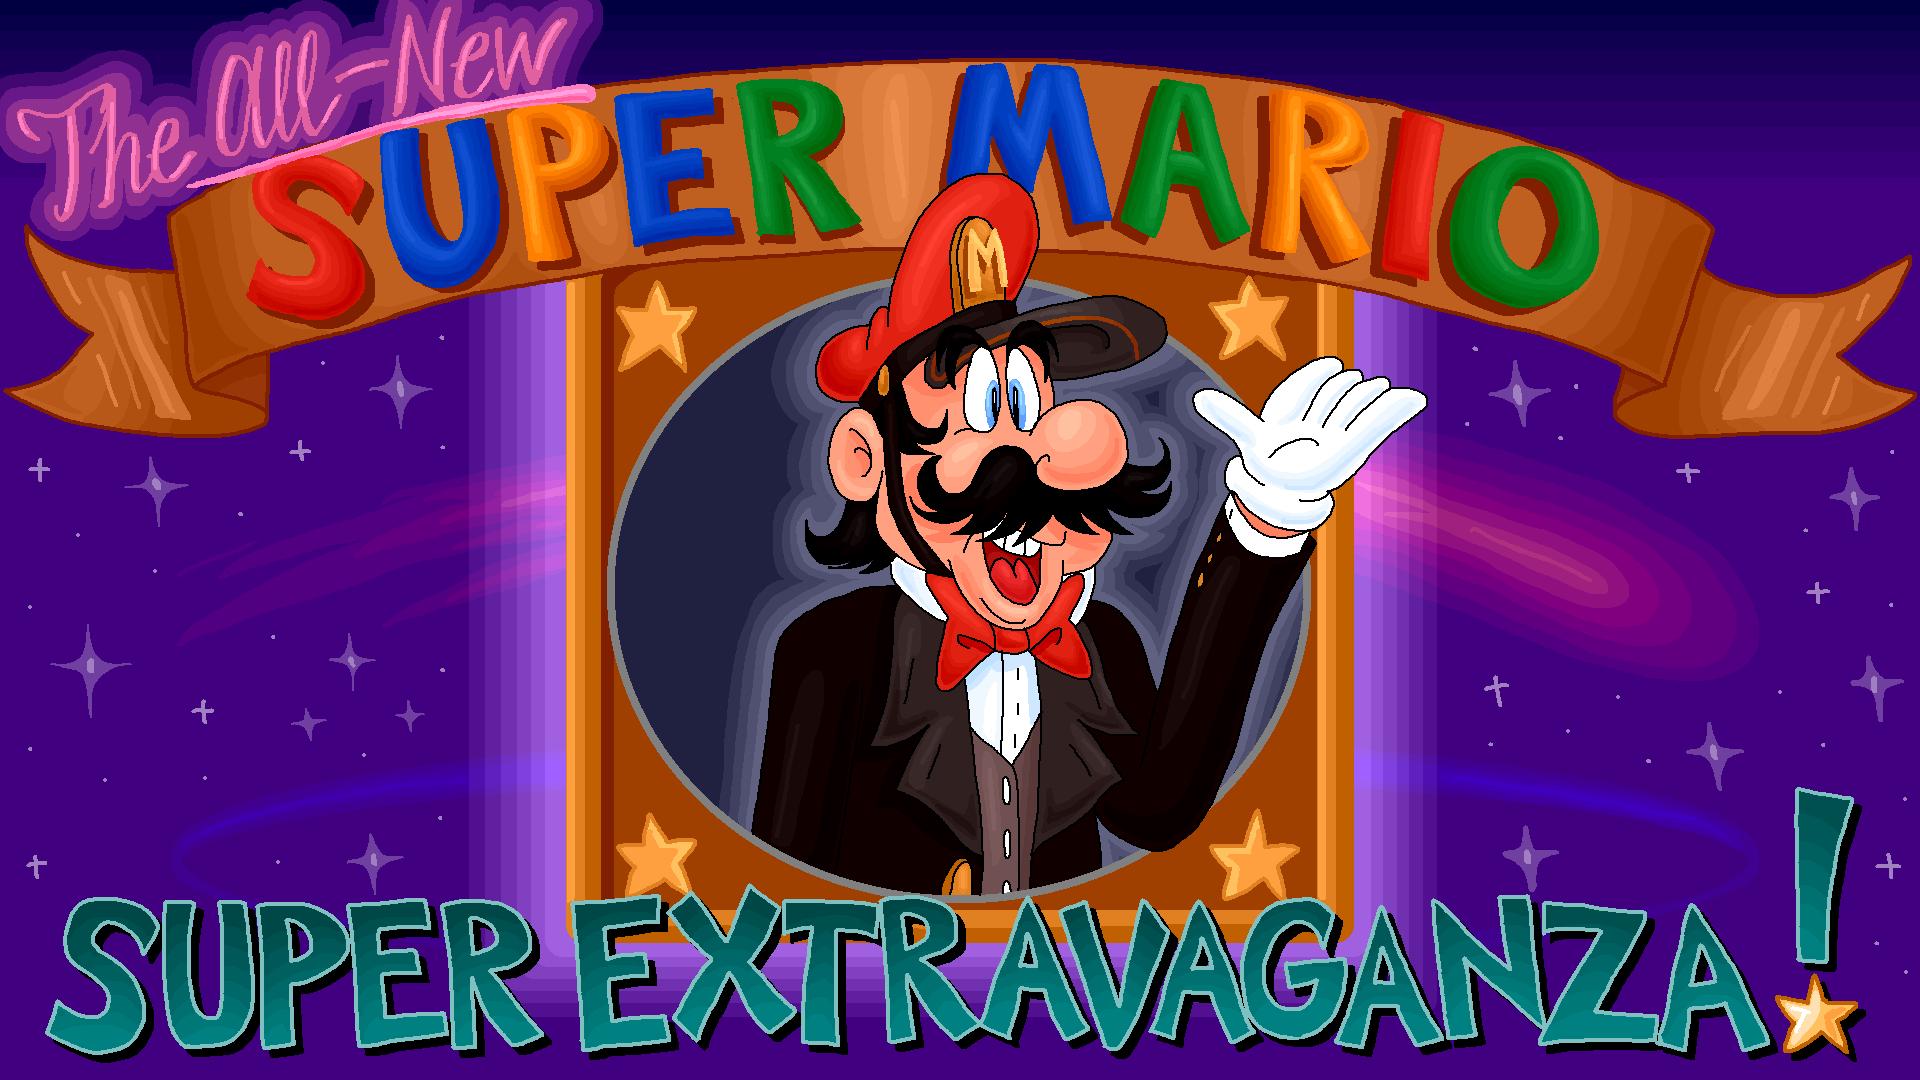 The All-New Super Mario Super Extravaganza! Main Title Card